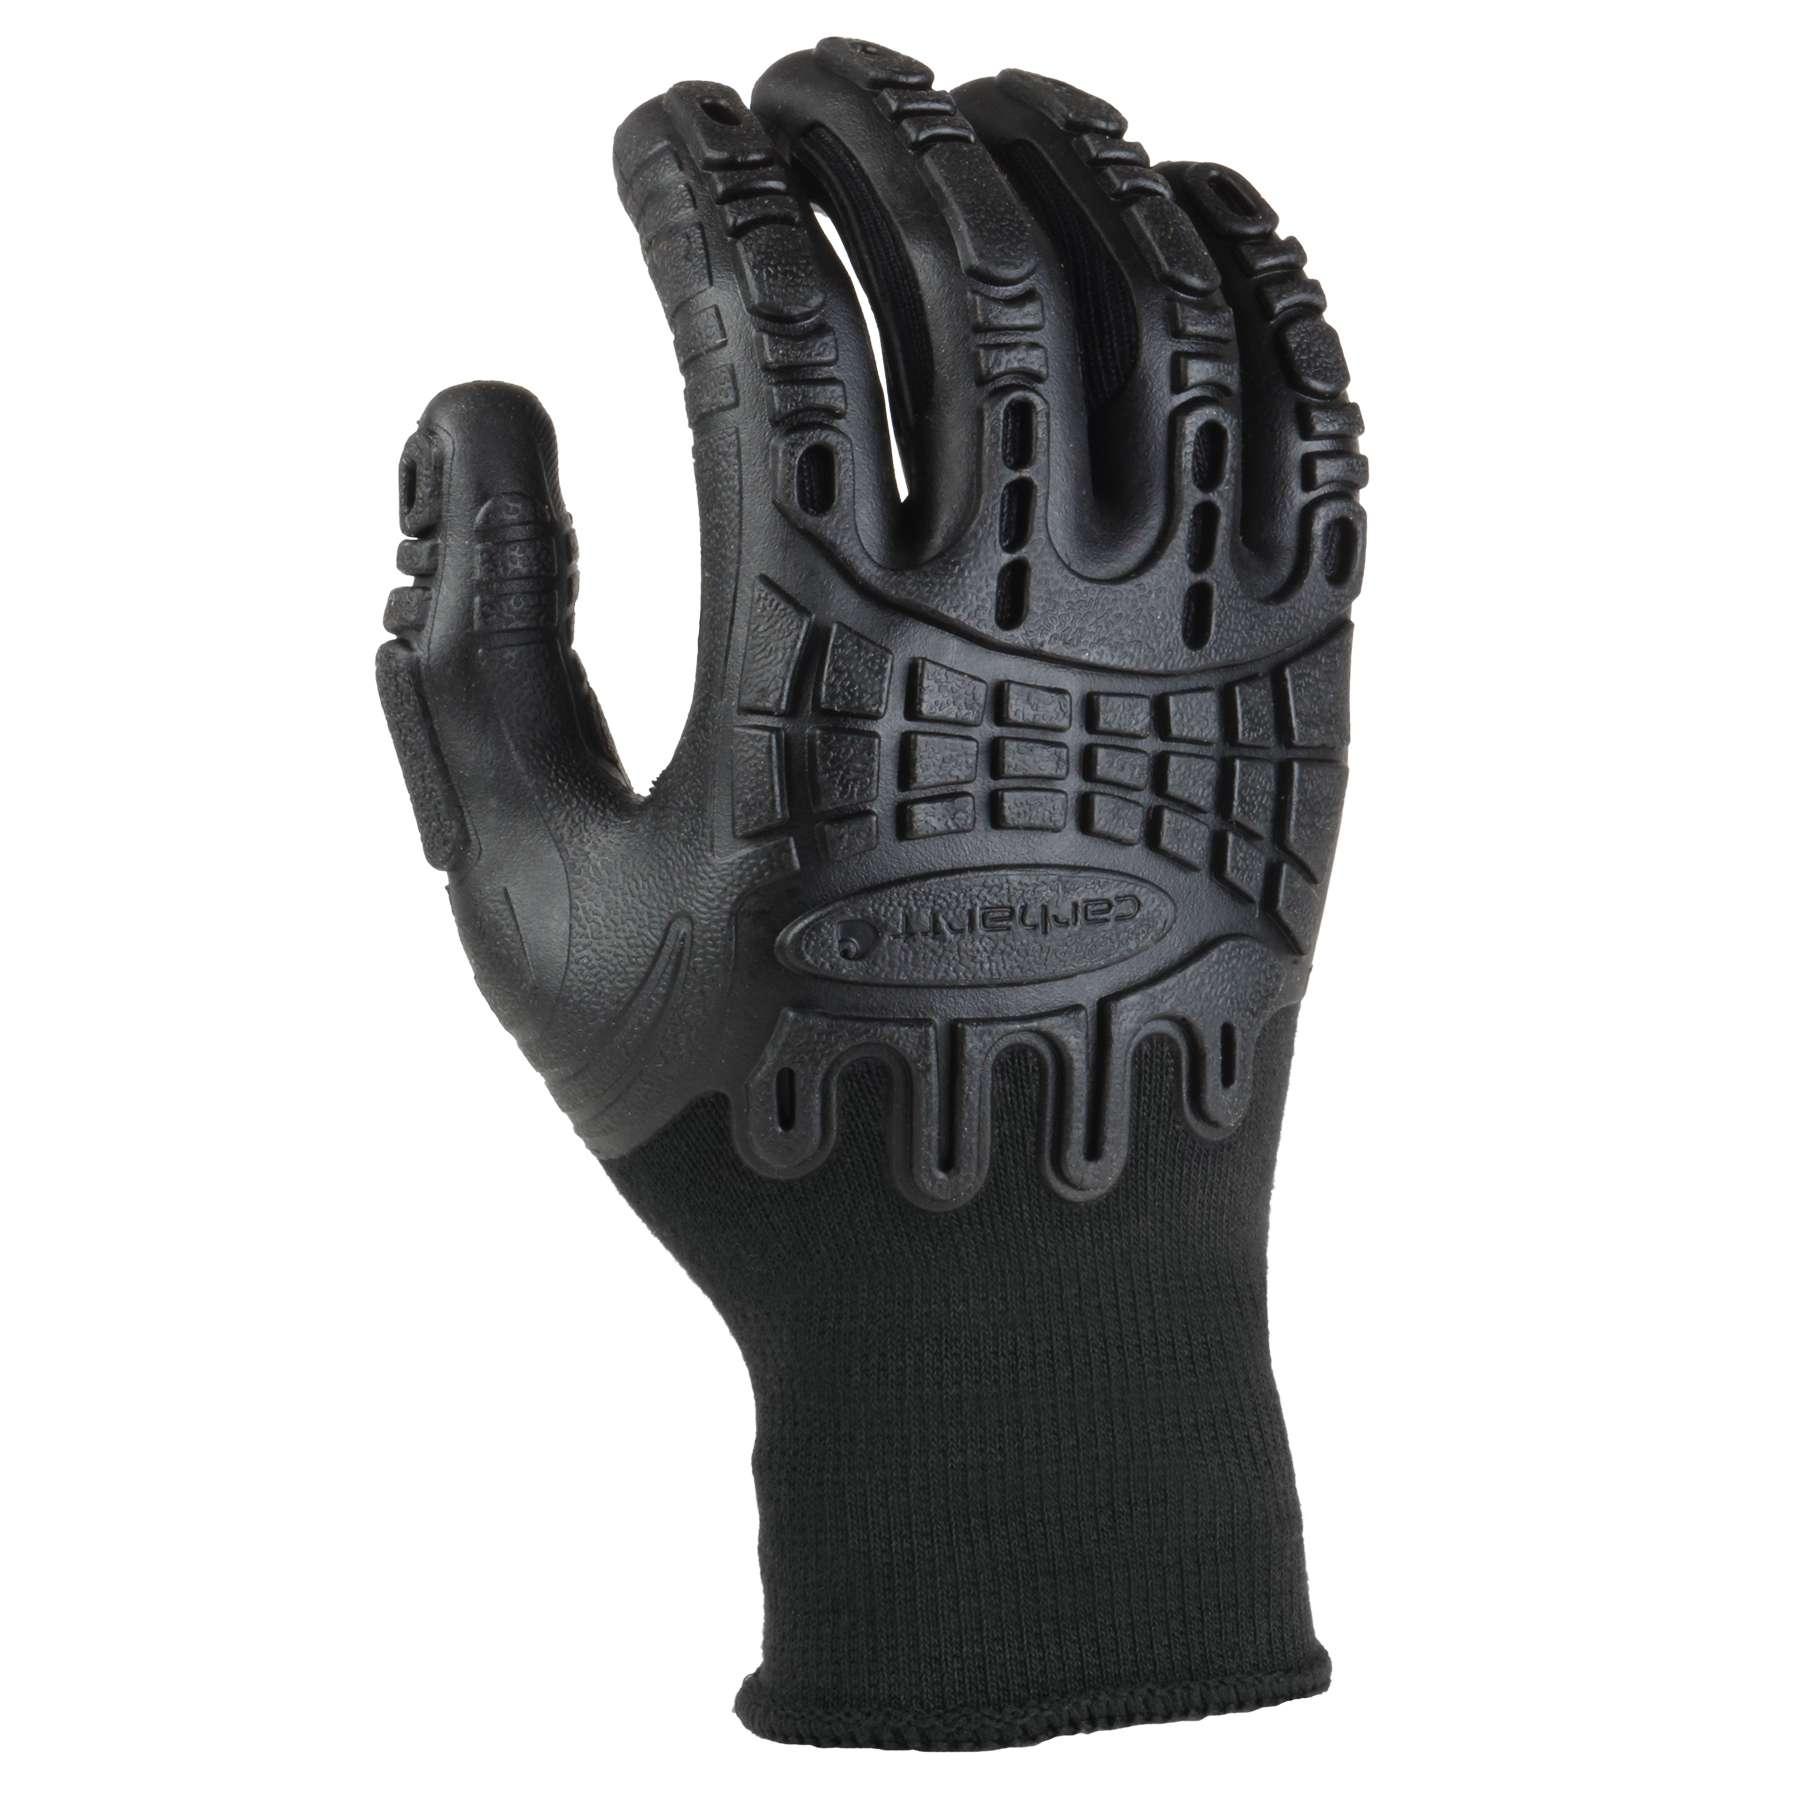 Carhartt Impact C-Grip Glove